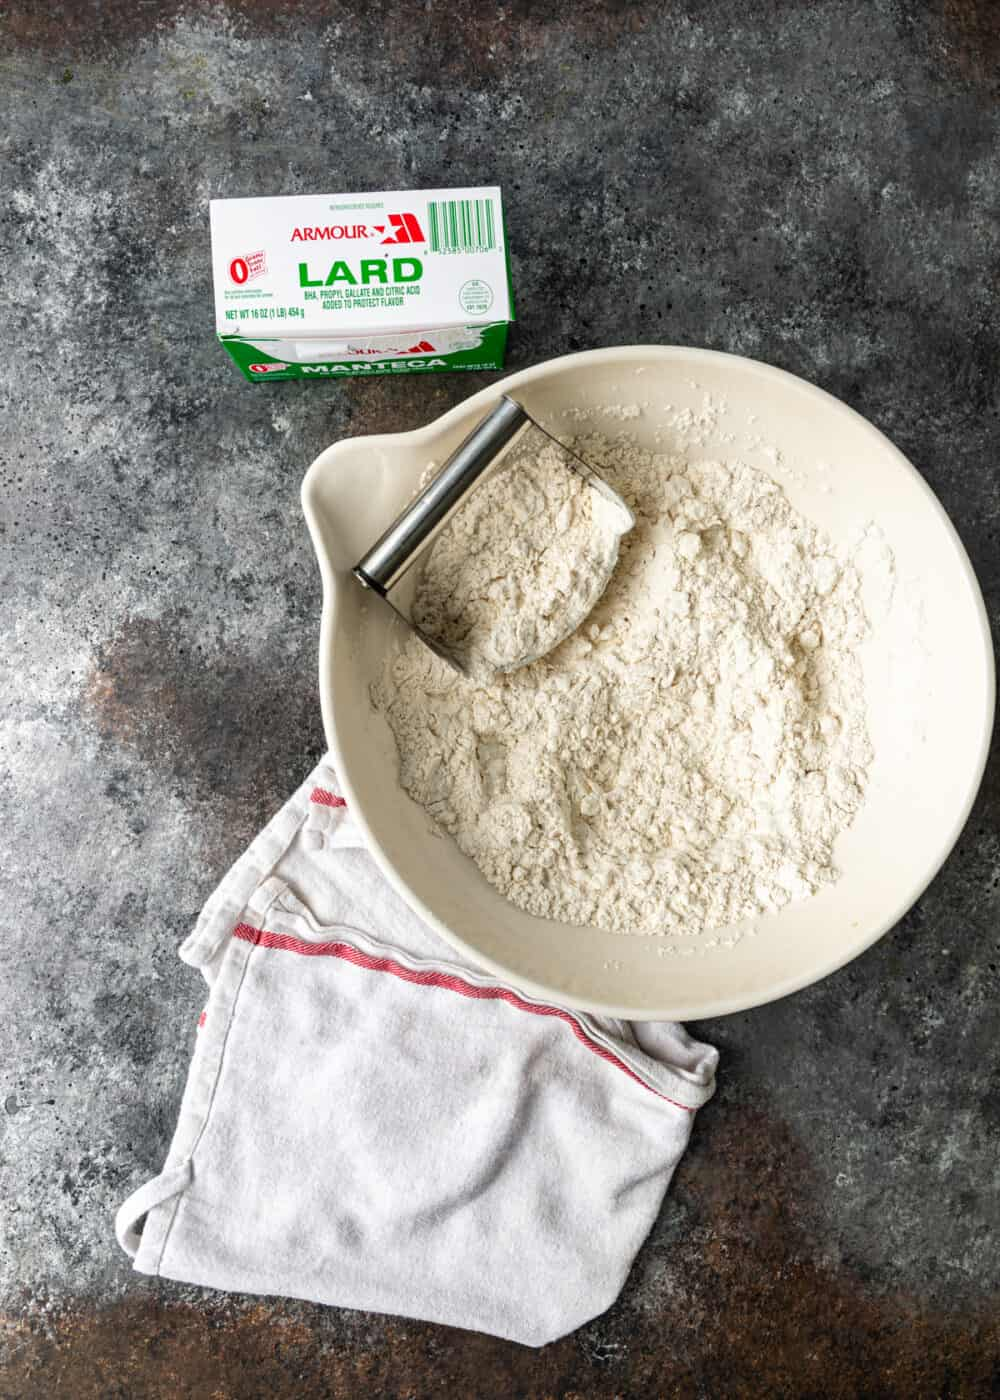 cutting lard into all purpose flour for empanada dough